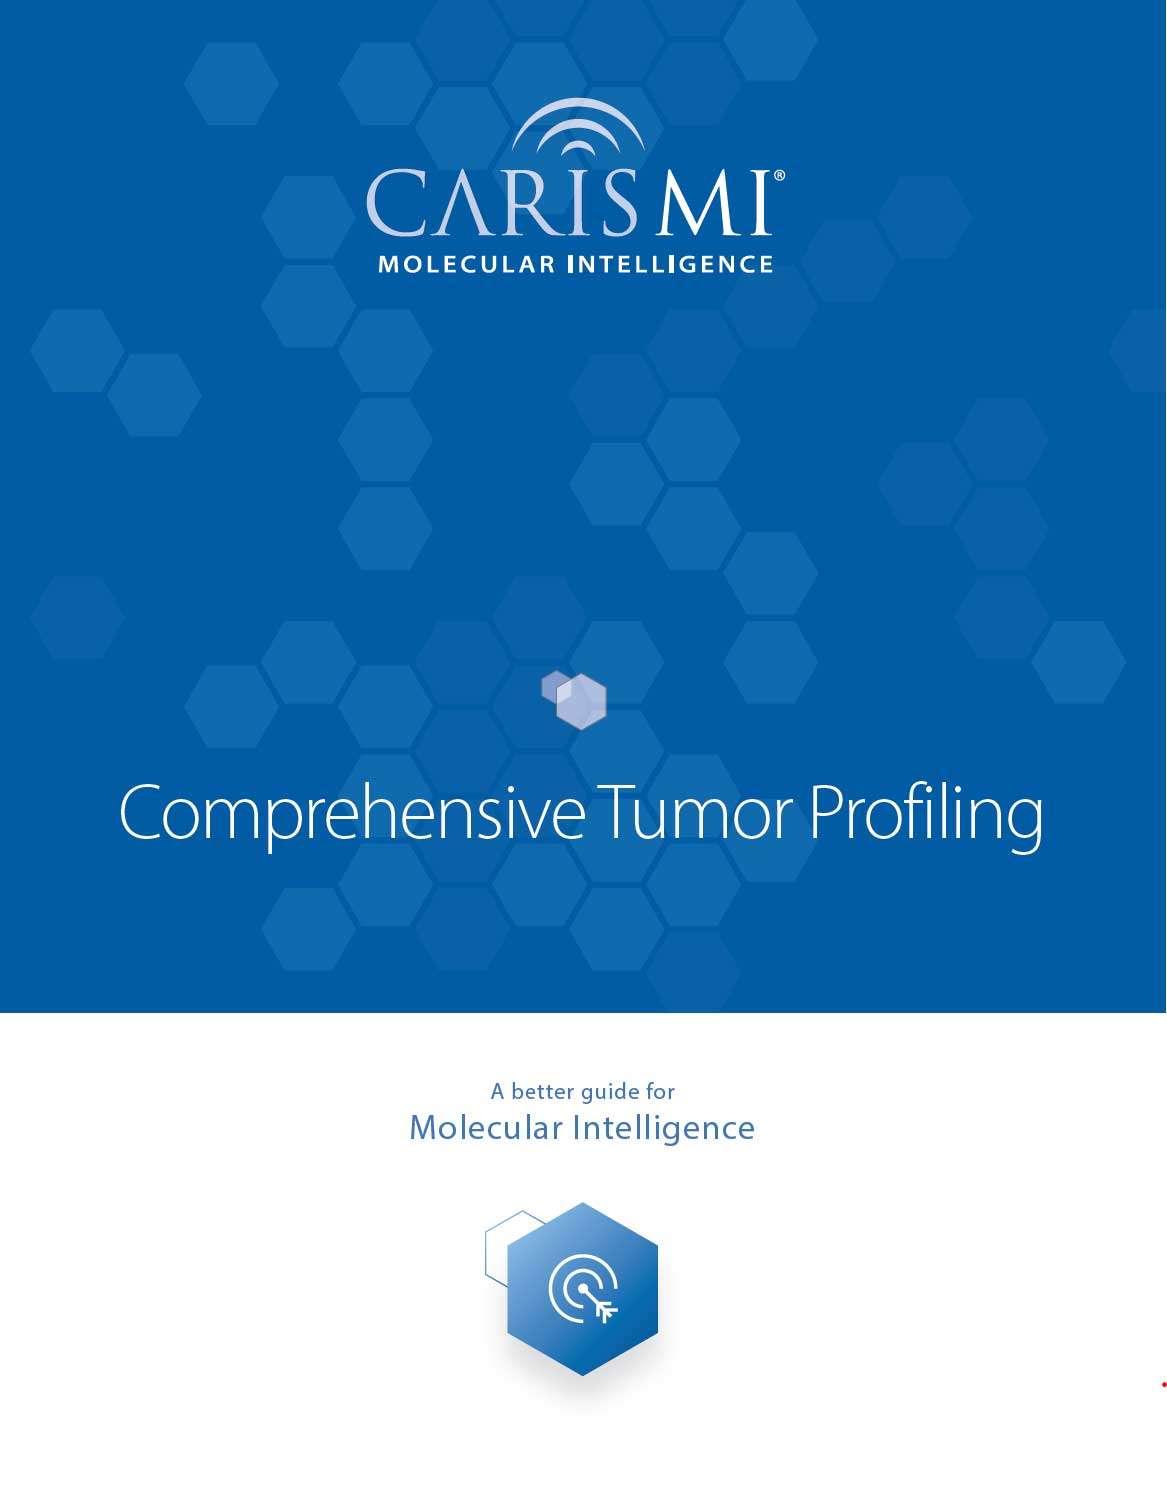 KCRS-Sponsor-Caris-Life-Sciences-MI-Tumor-Profiling